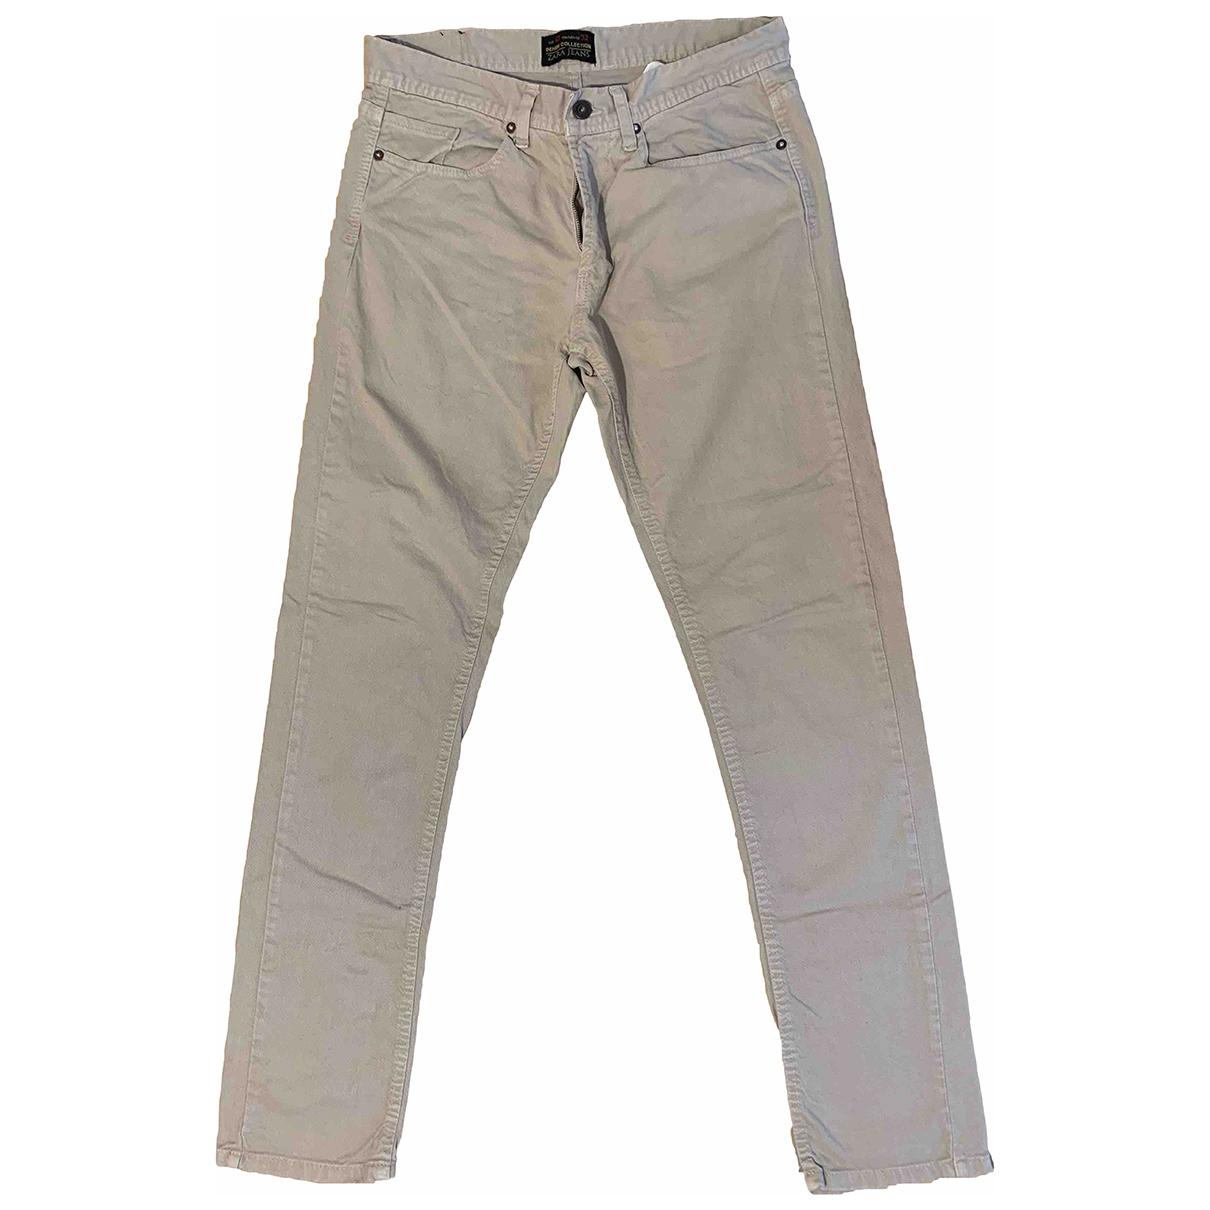 Pantalones en Algodon Beige Zara